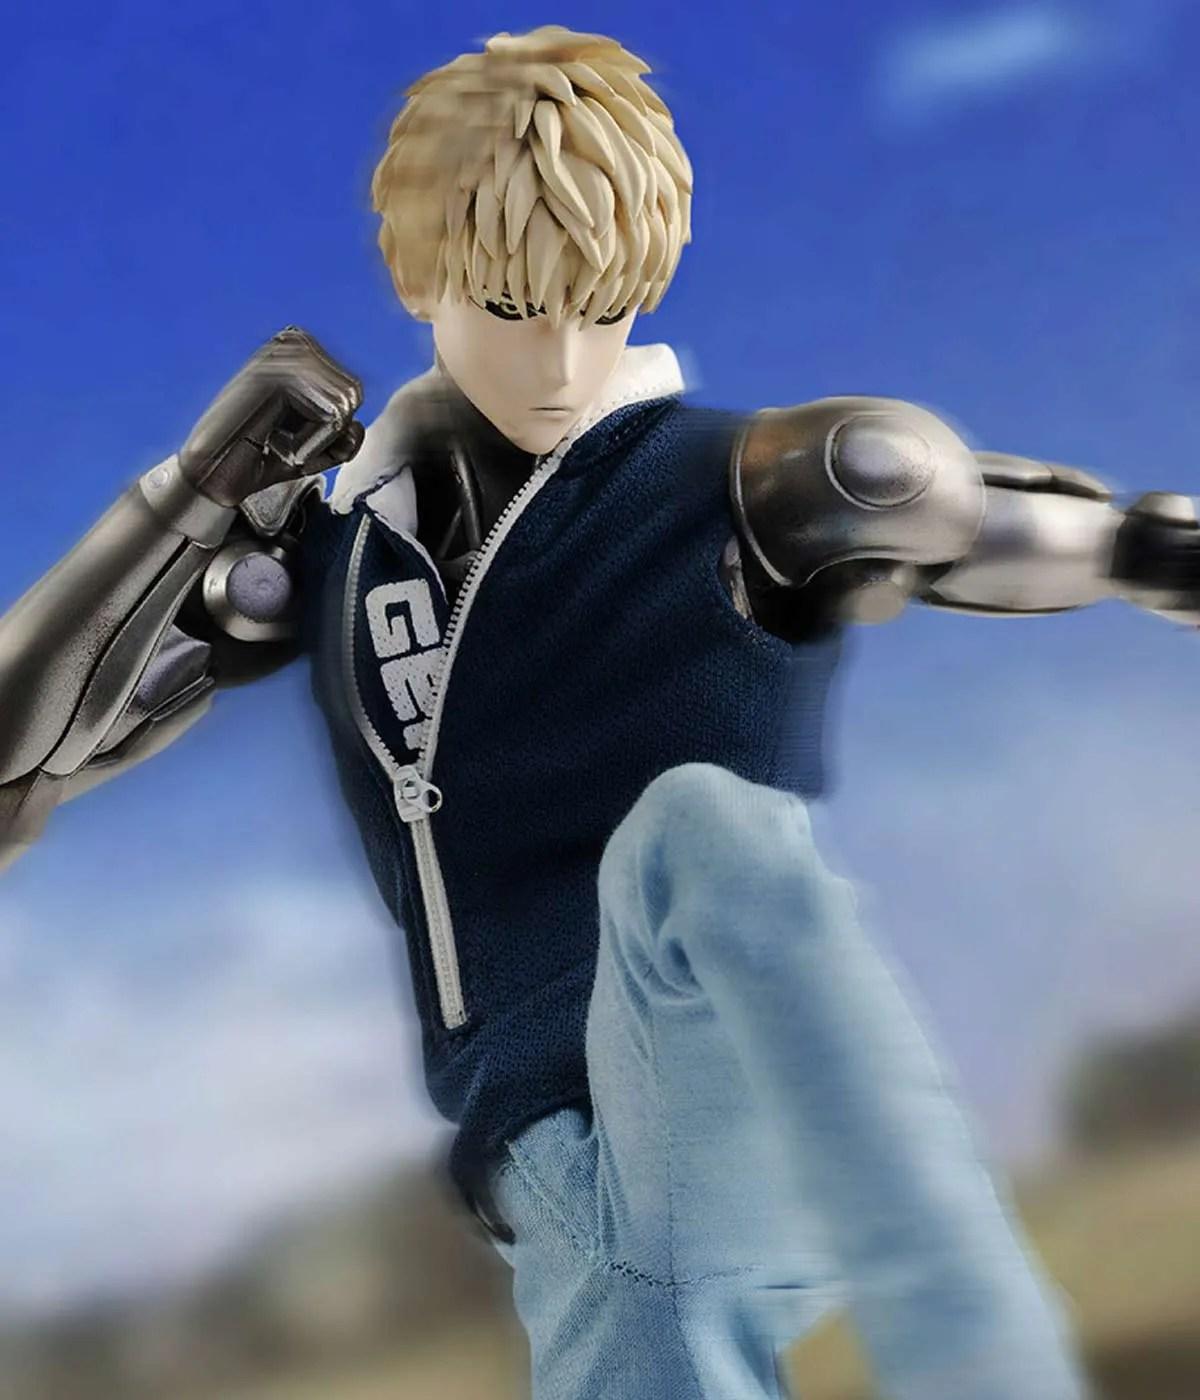 genos-one-punch-man-blue-jacket